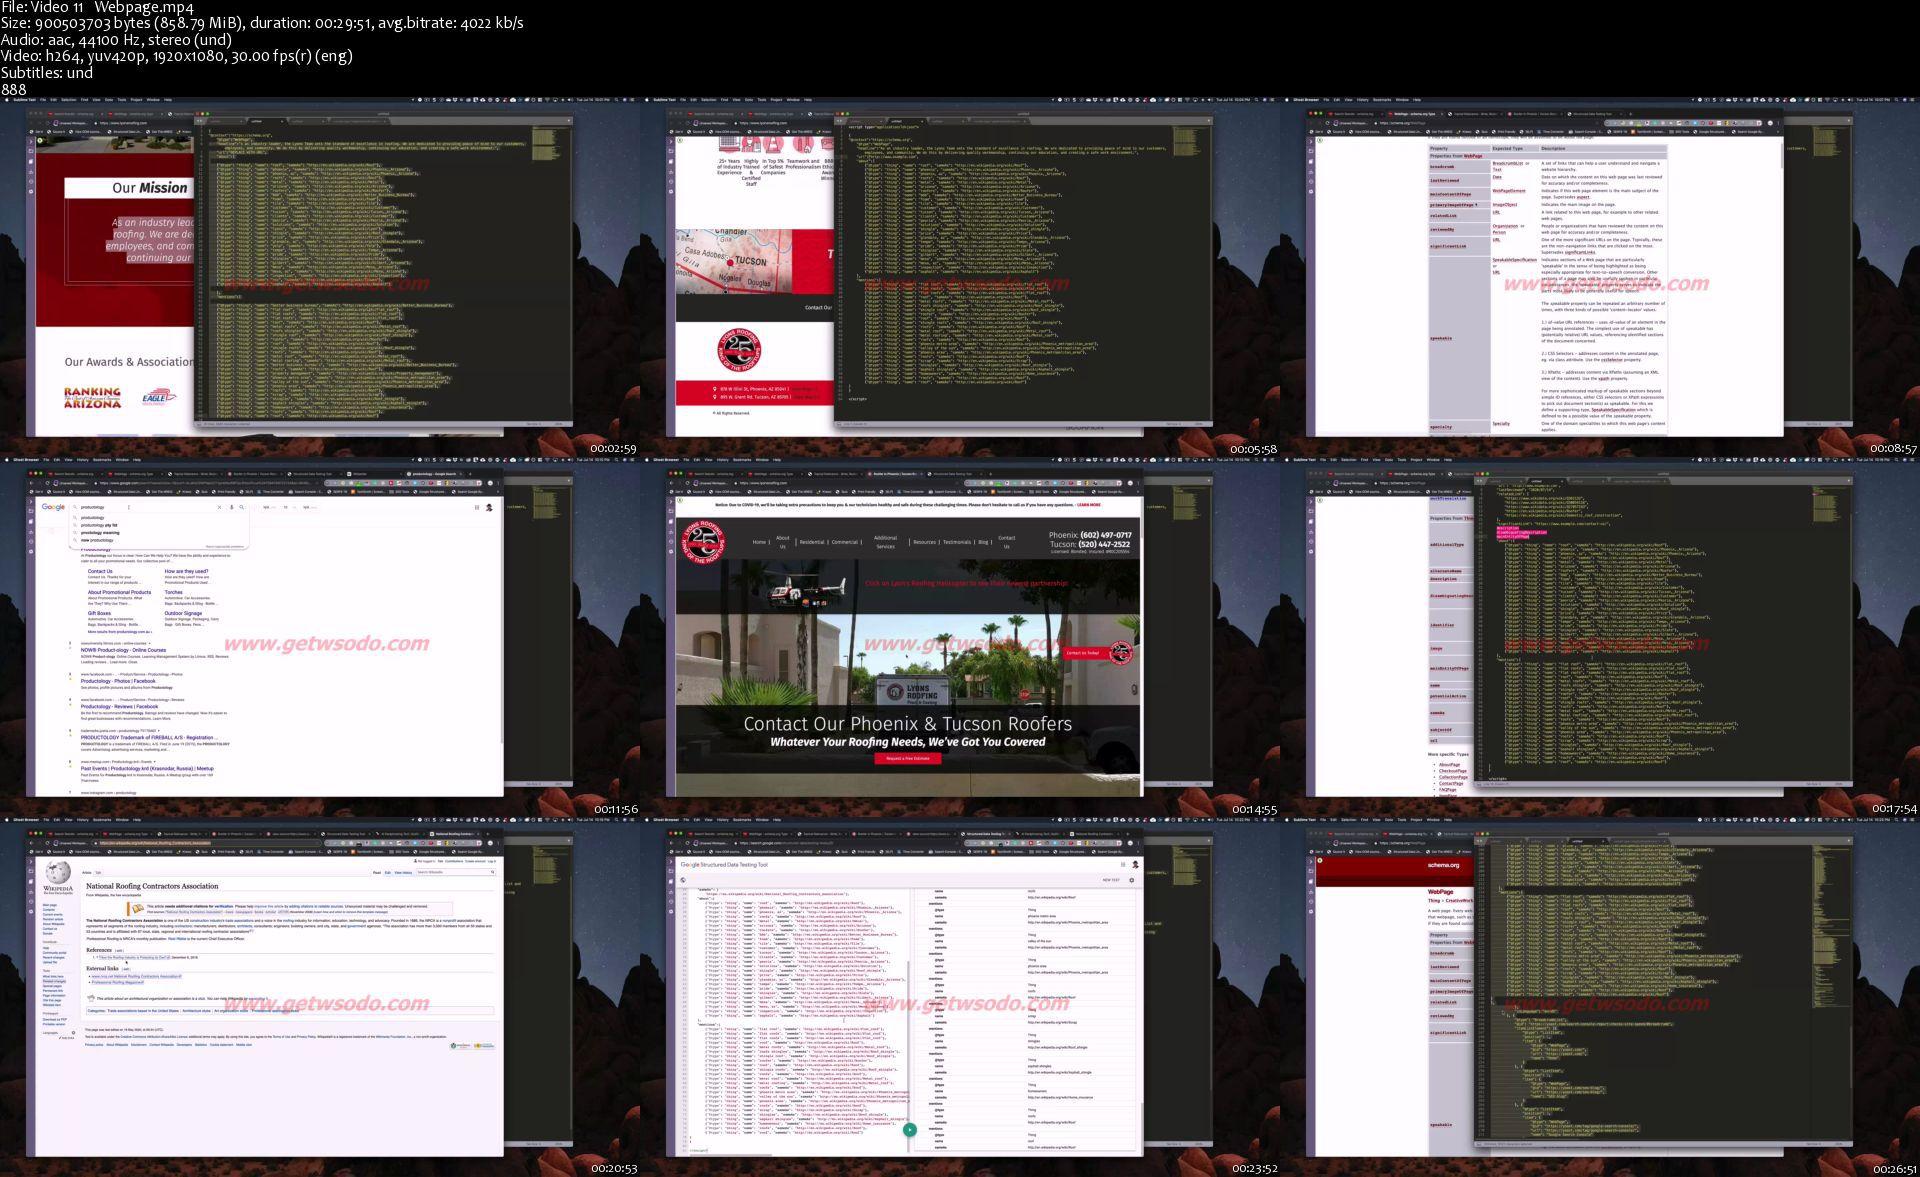 video11webpageszhj56.jpg